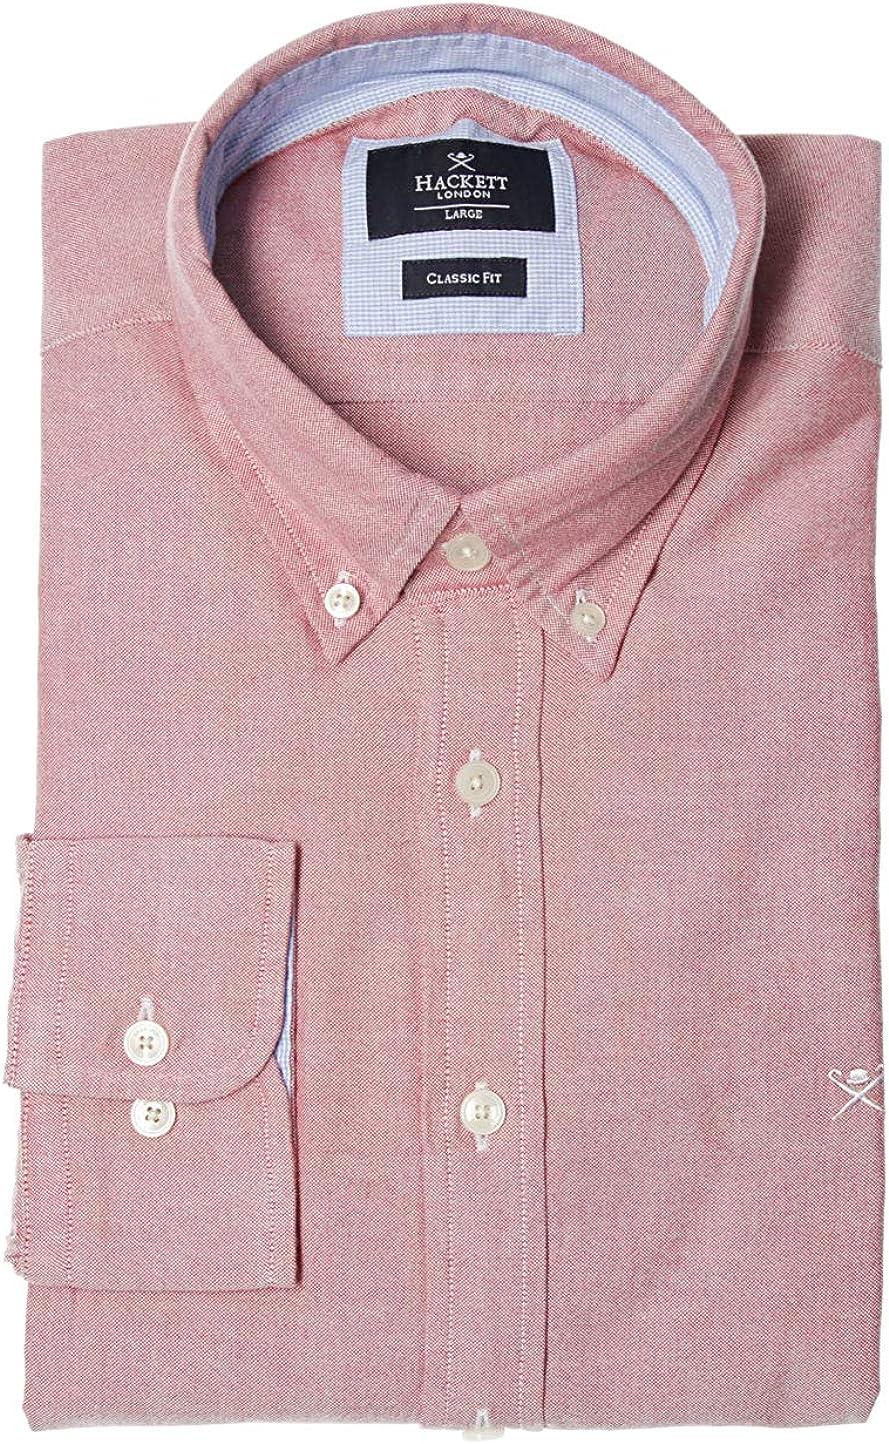 HACKETT LONDON GOLF Plain Oxford Men´s Shirt Pink, tamaño:S ...